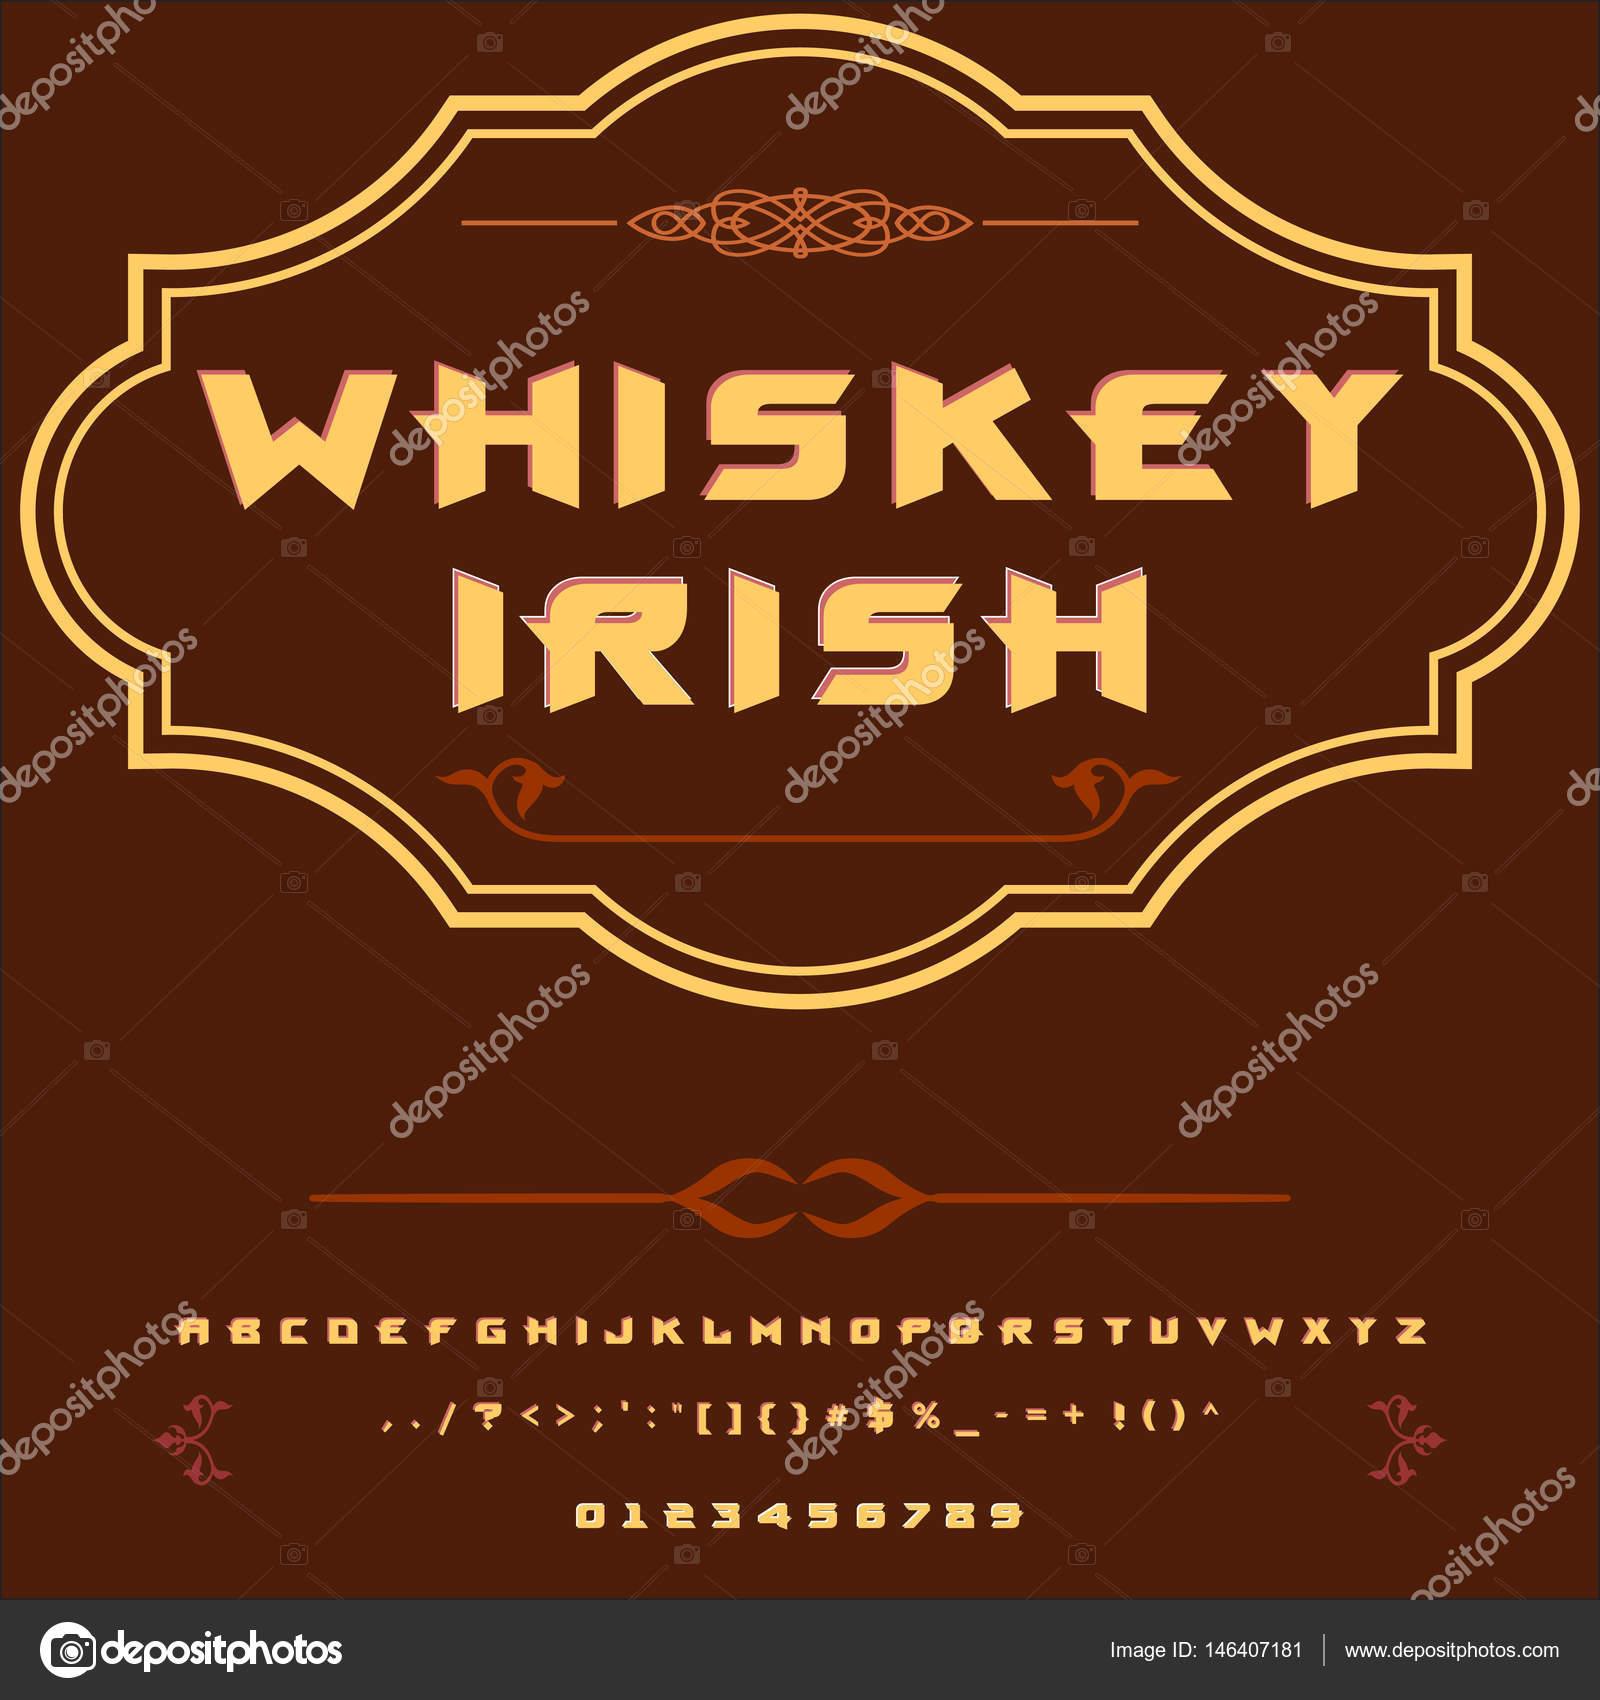 Script Font Typeface Whiskey irish-vintage script font